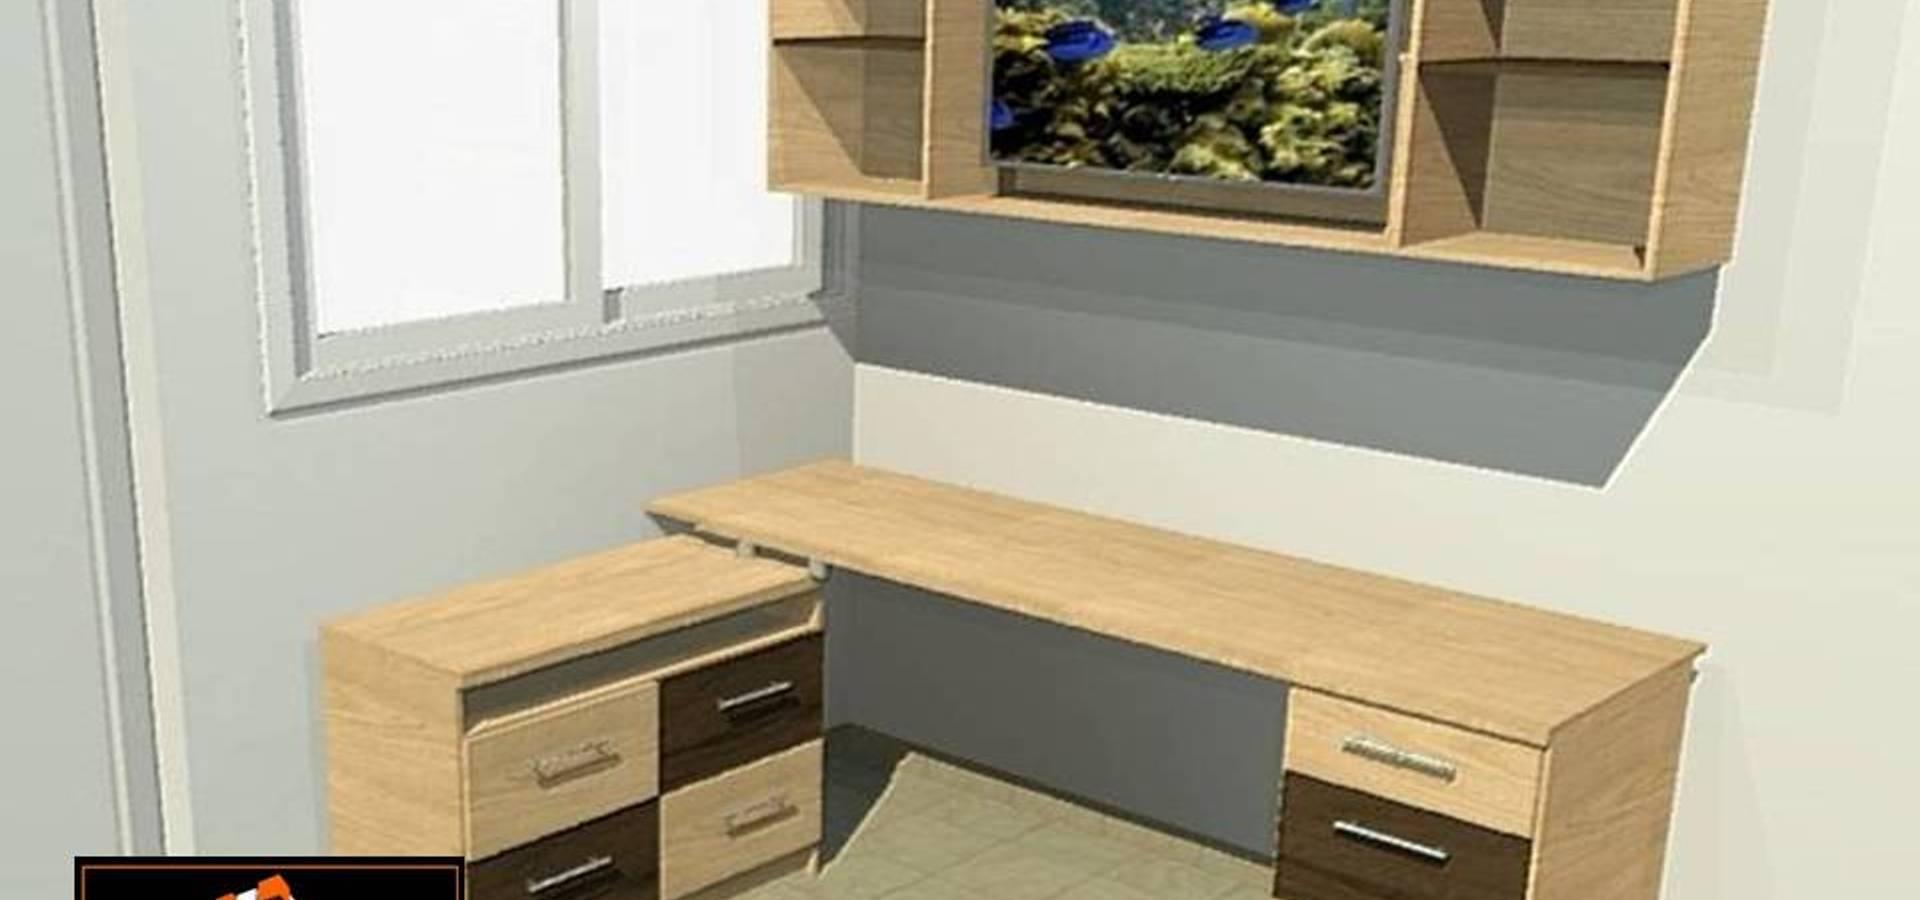 Centro De Estudio De A Tu Medida Muebles Modulares Homify # Muebles Modulares